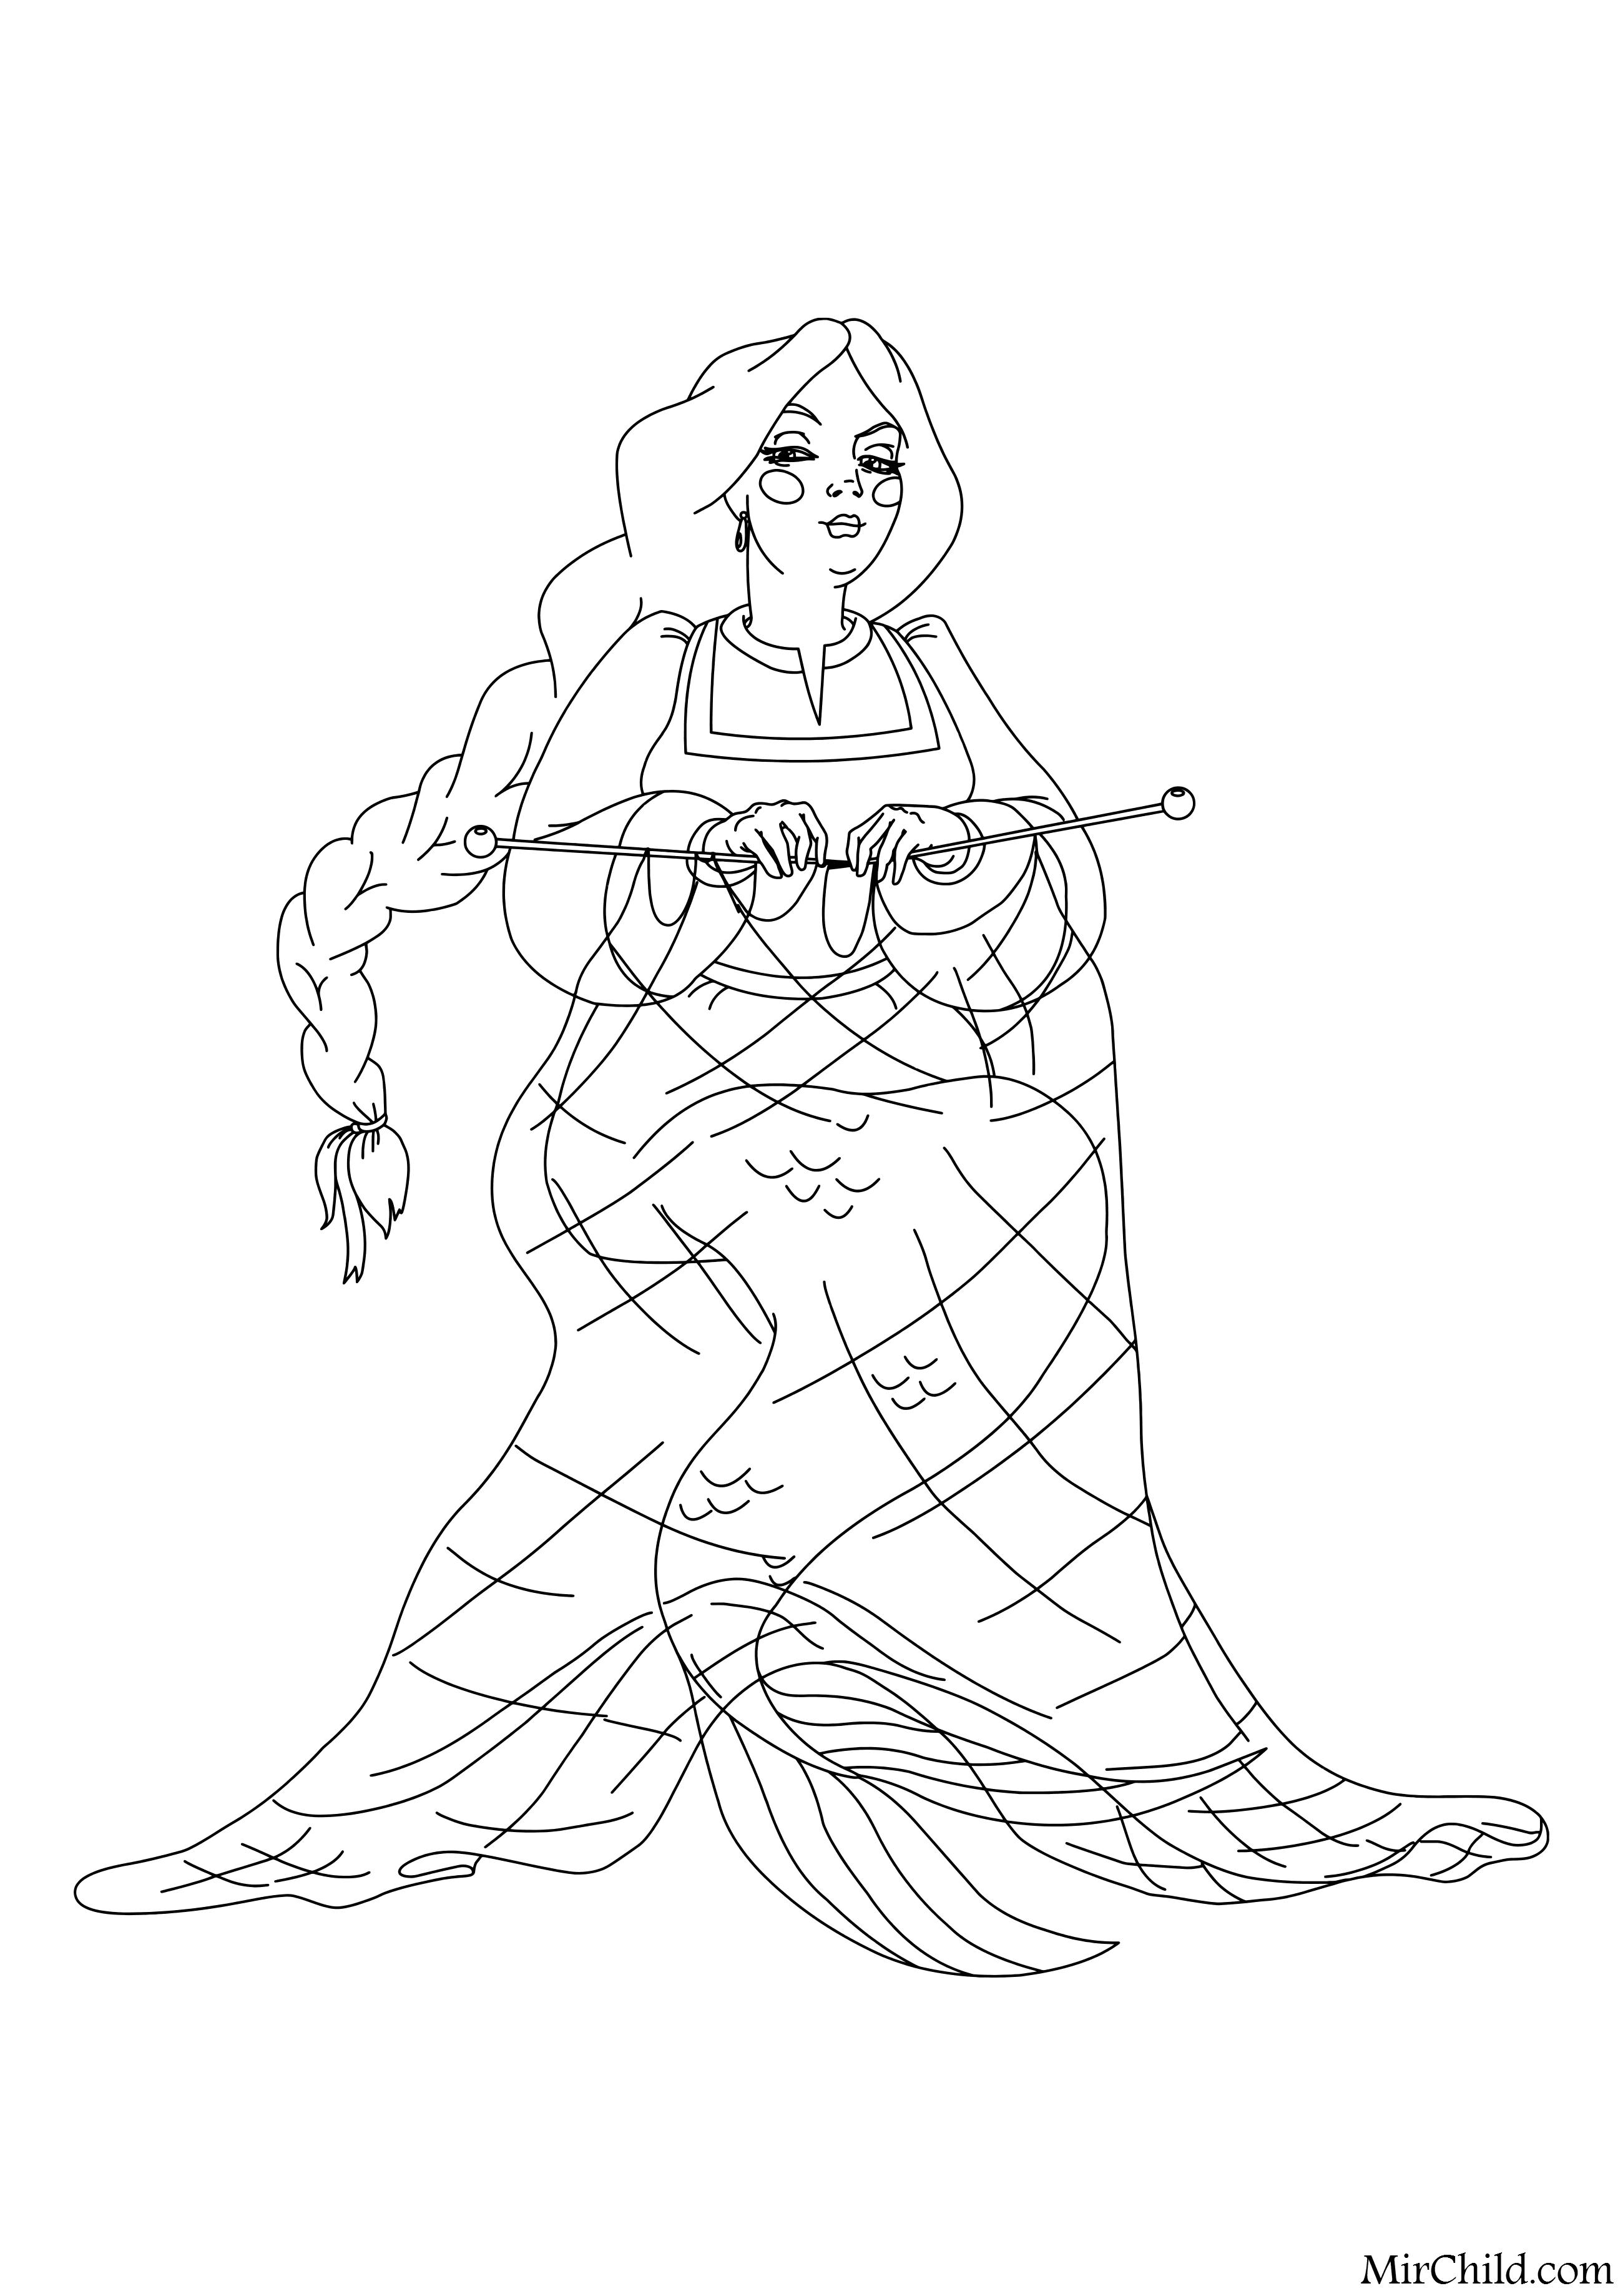 Раскраска - Три богатыря и морской царь - Настасья ...